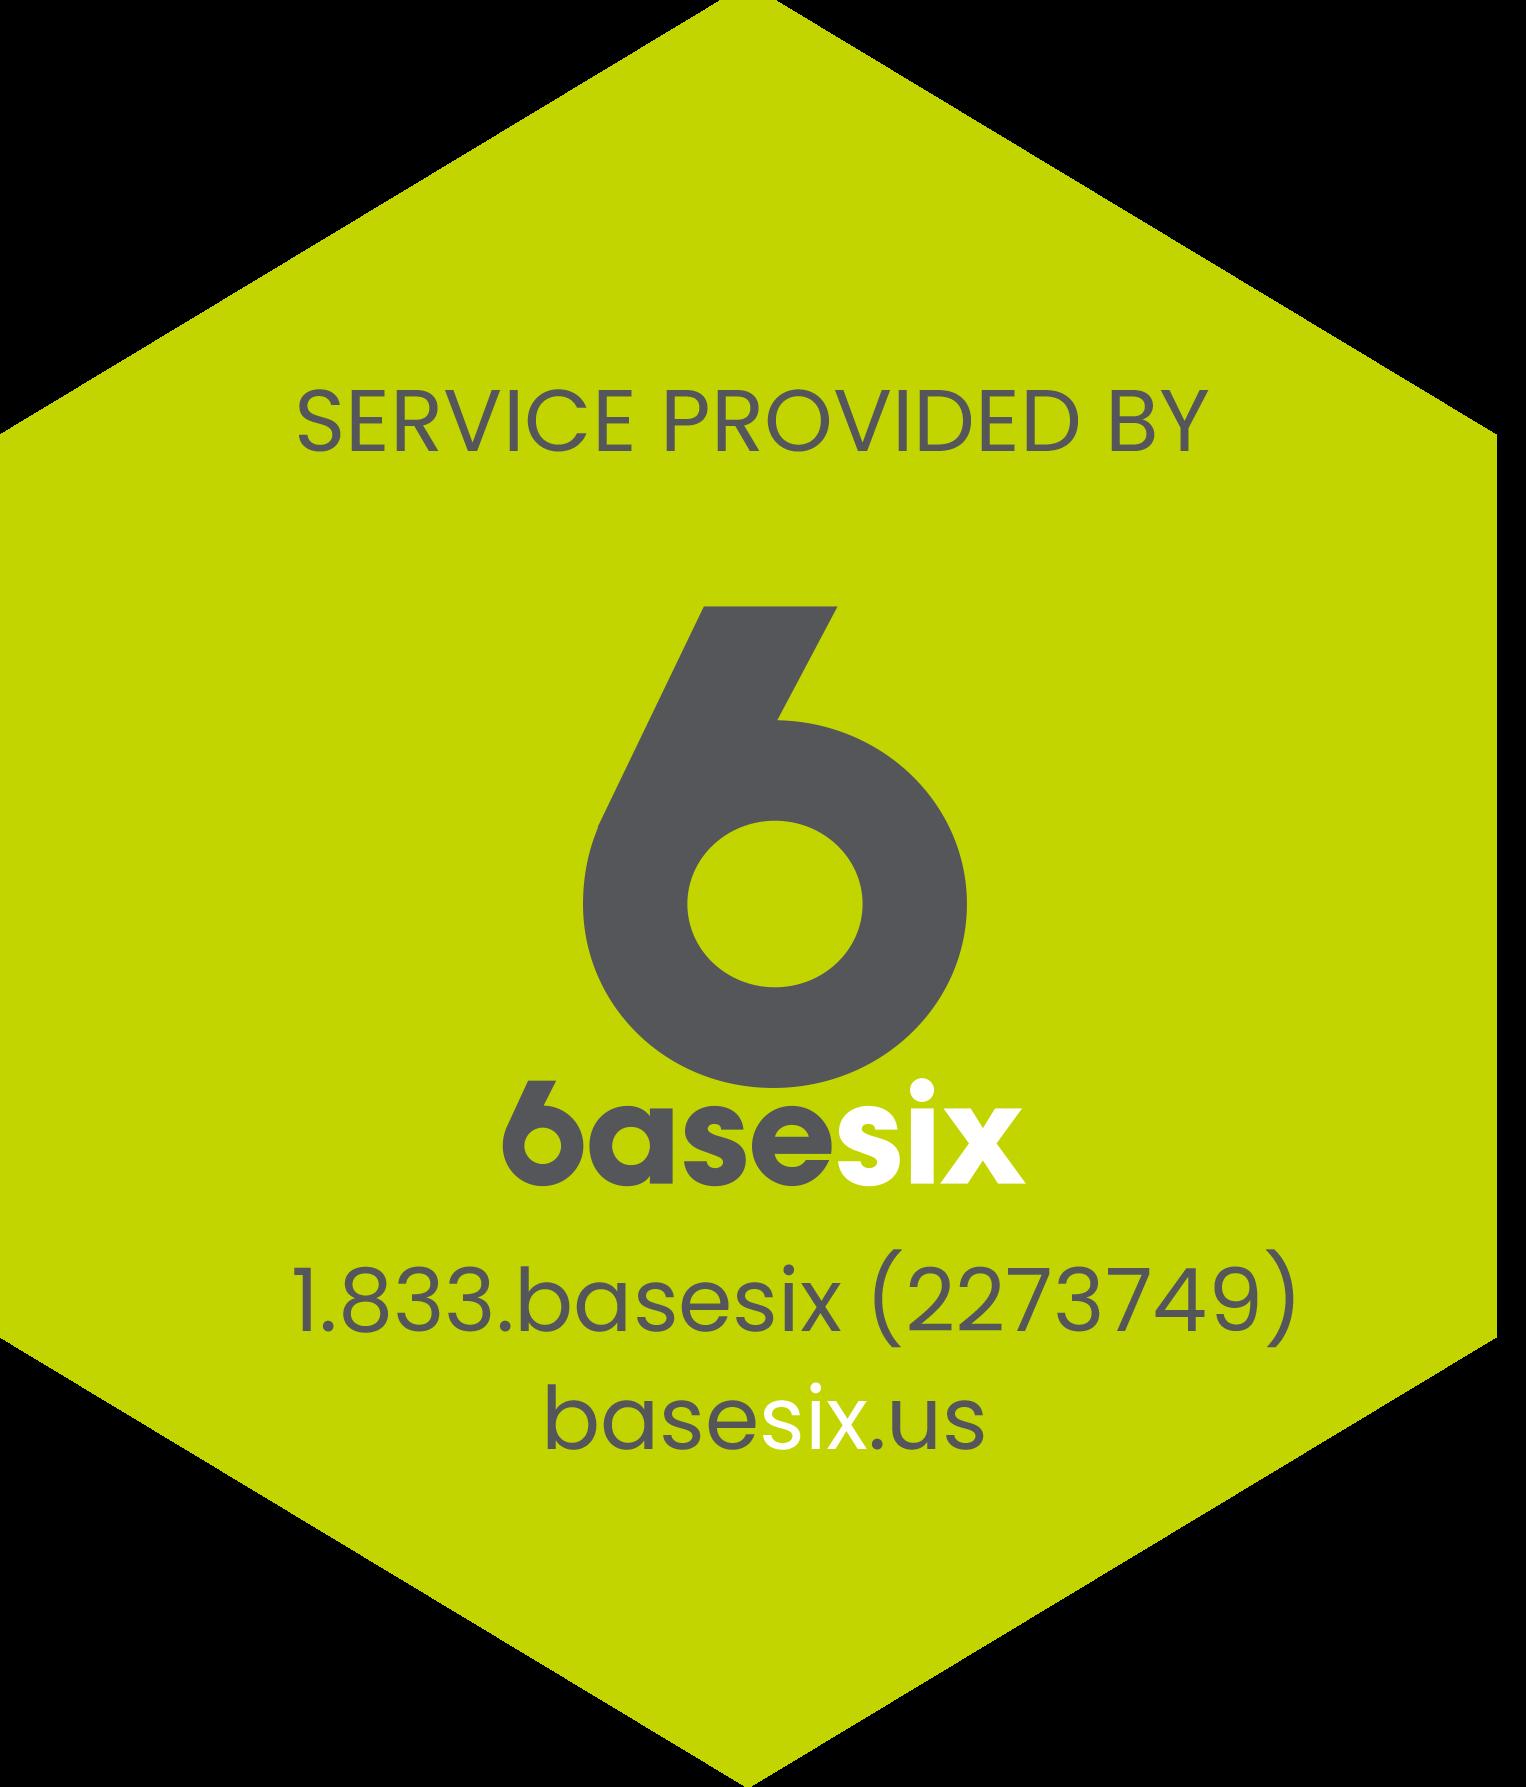 Basesix